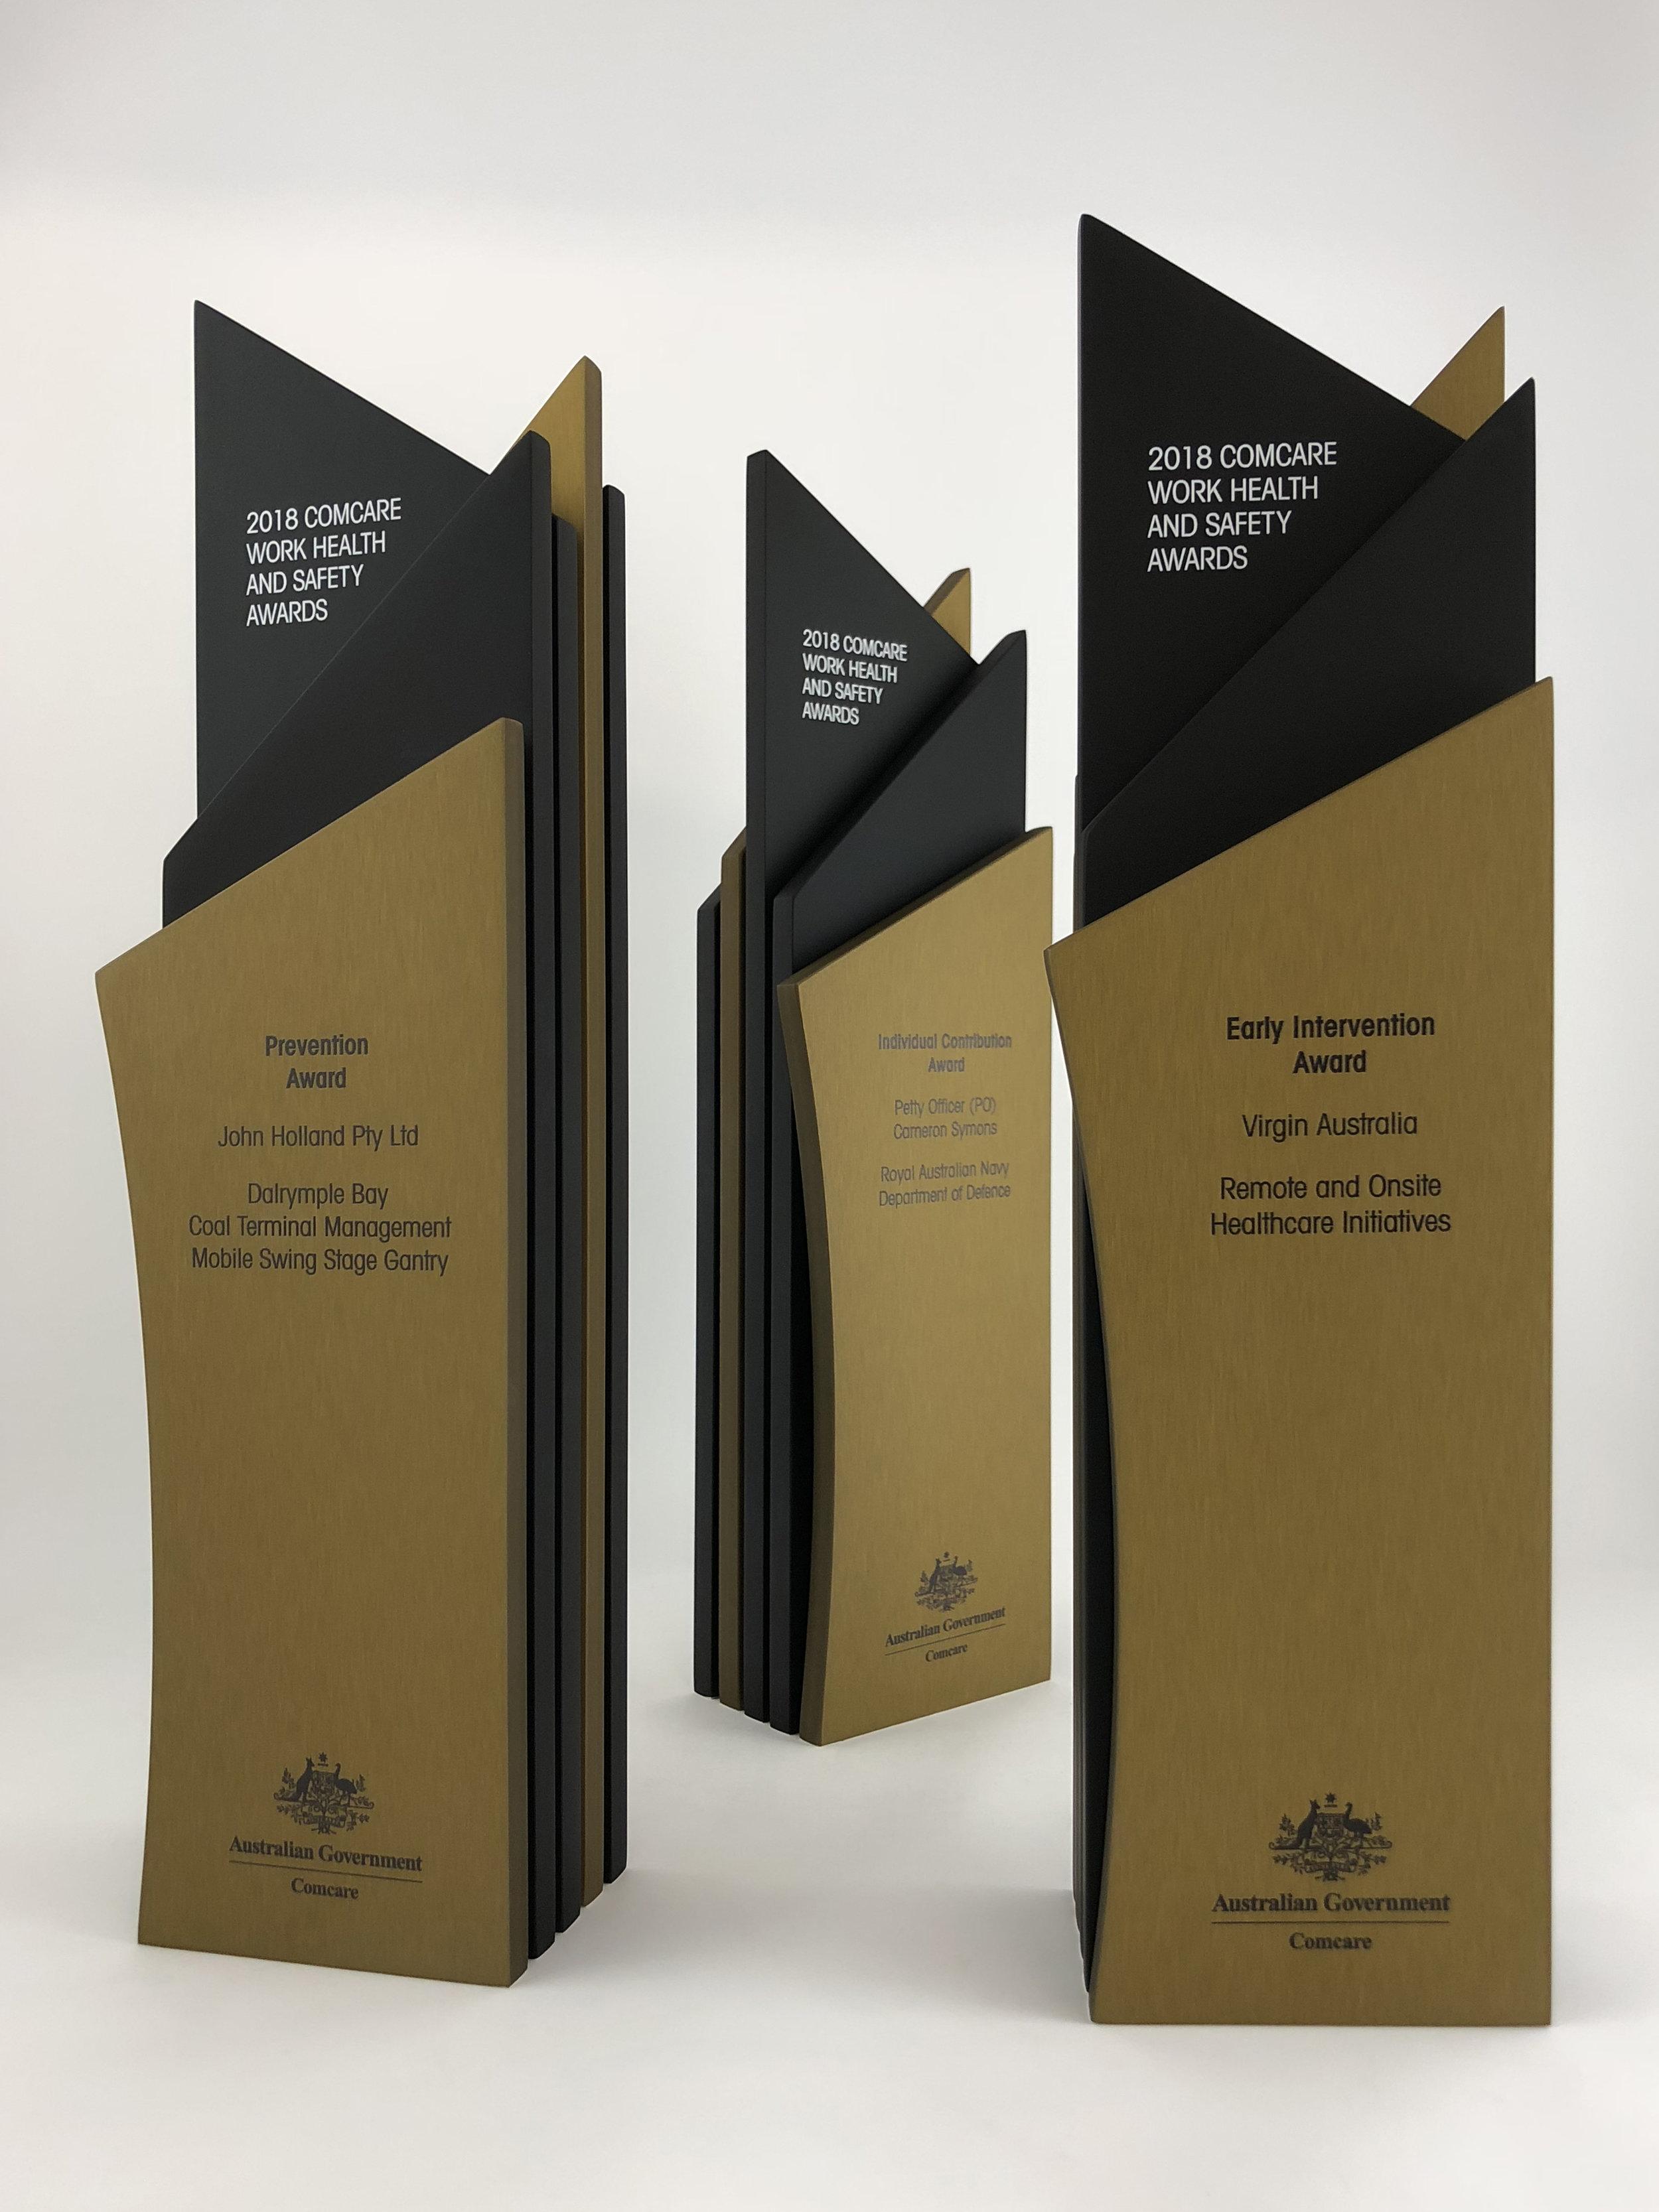 comcare-whs-awards-metal-trophy-01.jpg